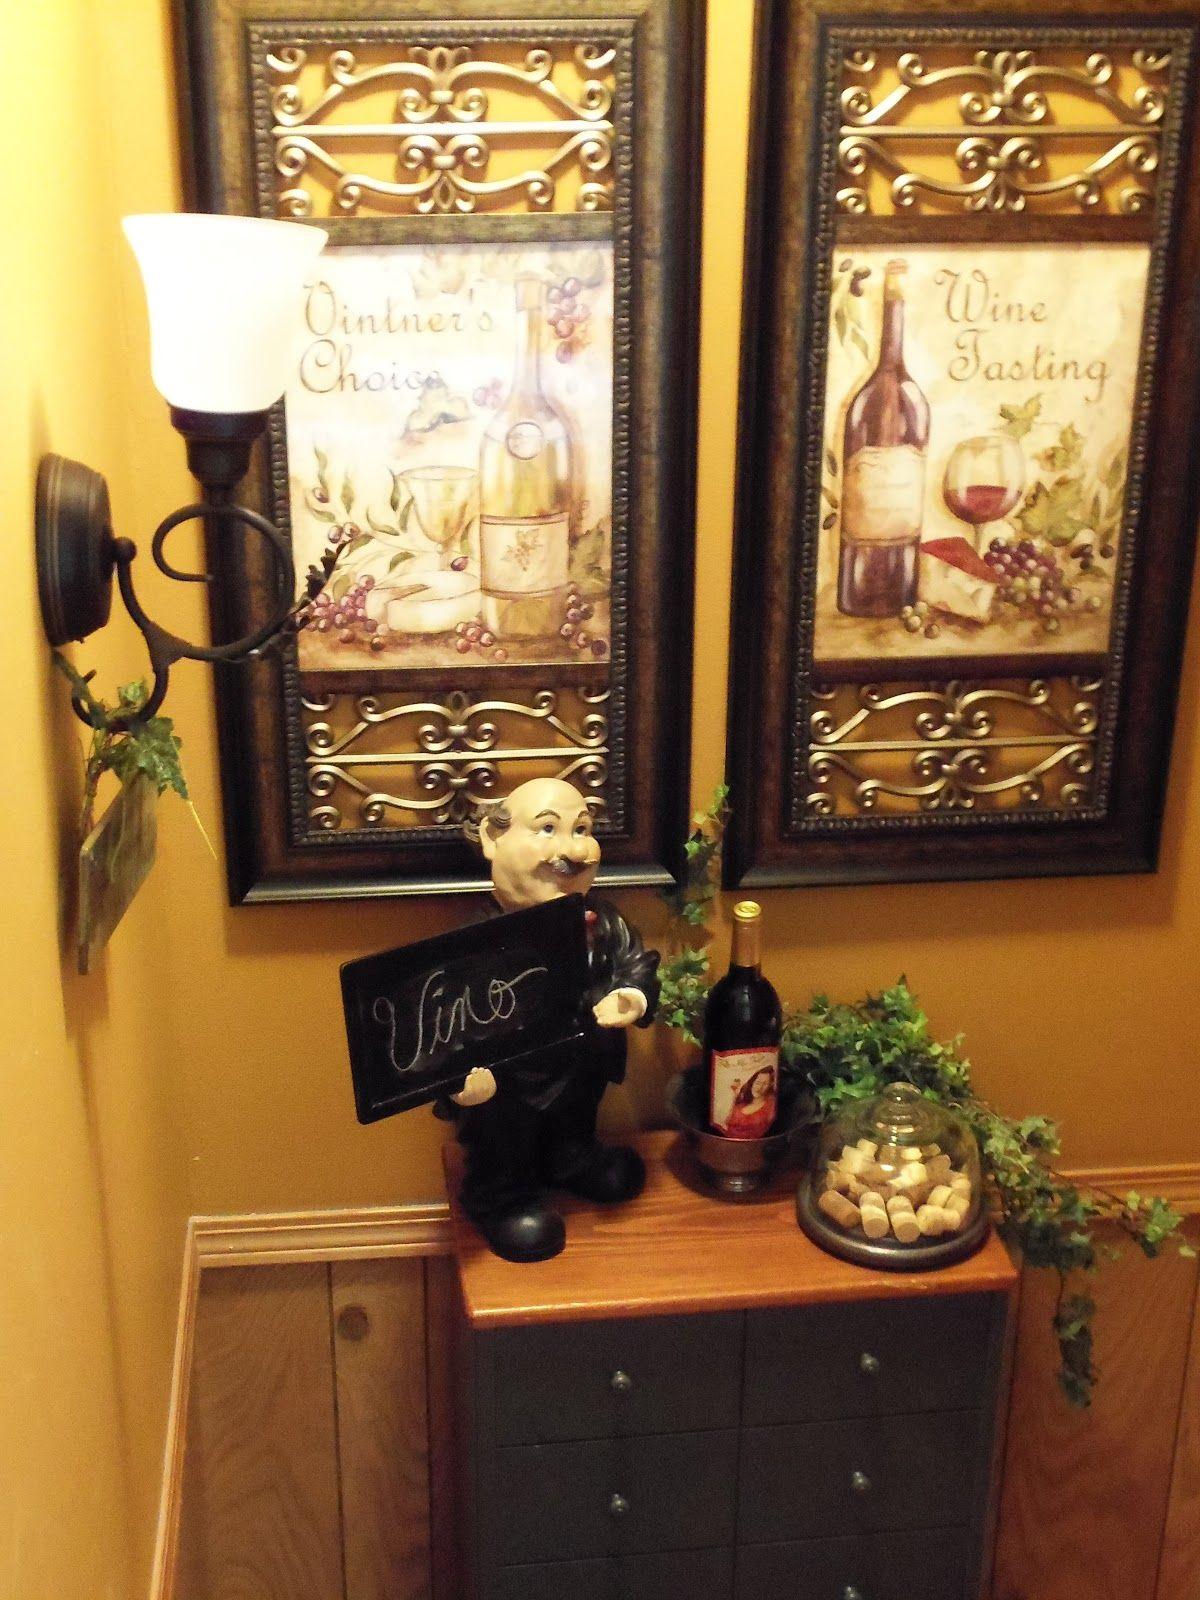 I Ll Have Another Wine Decor Kitchen Wine Theme Kitchen Wine Decor